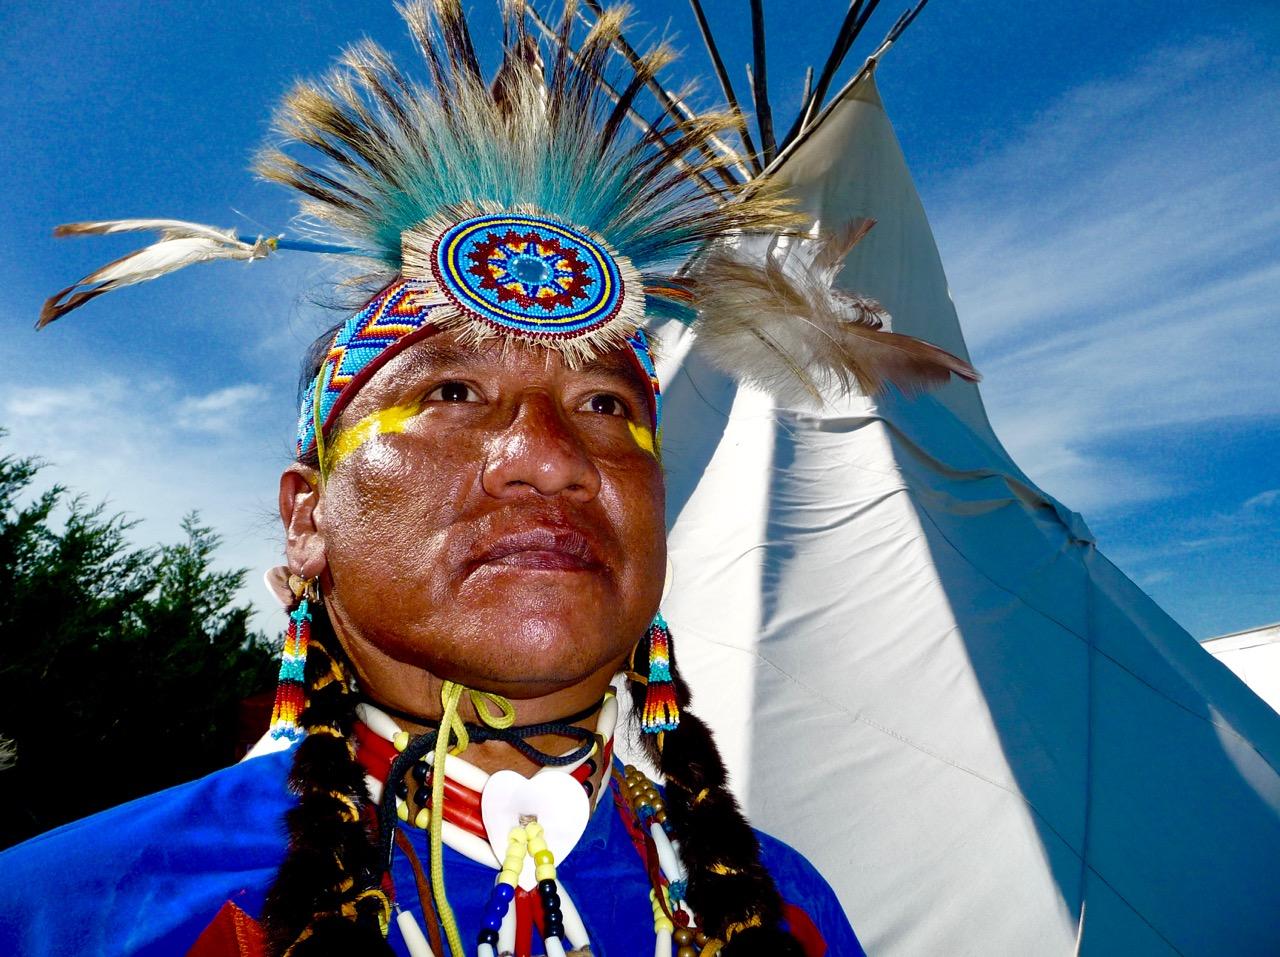 Gilbert Emery Brown, Meskwaki, Rosebud Powwow, South Dakota, United States of America, 2011.